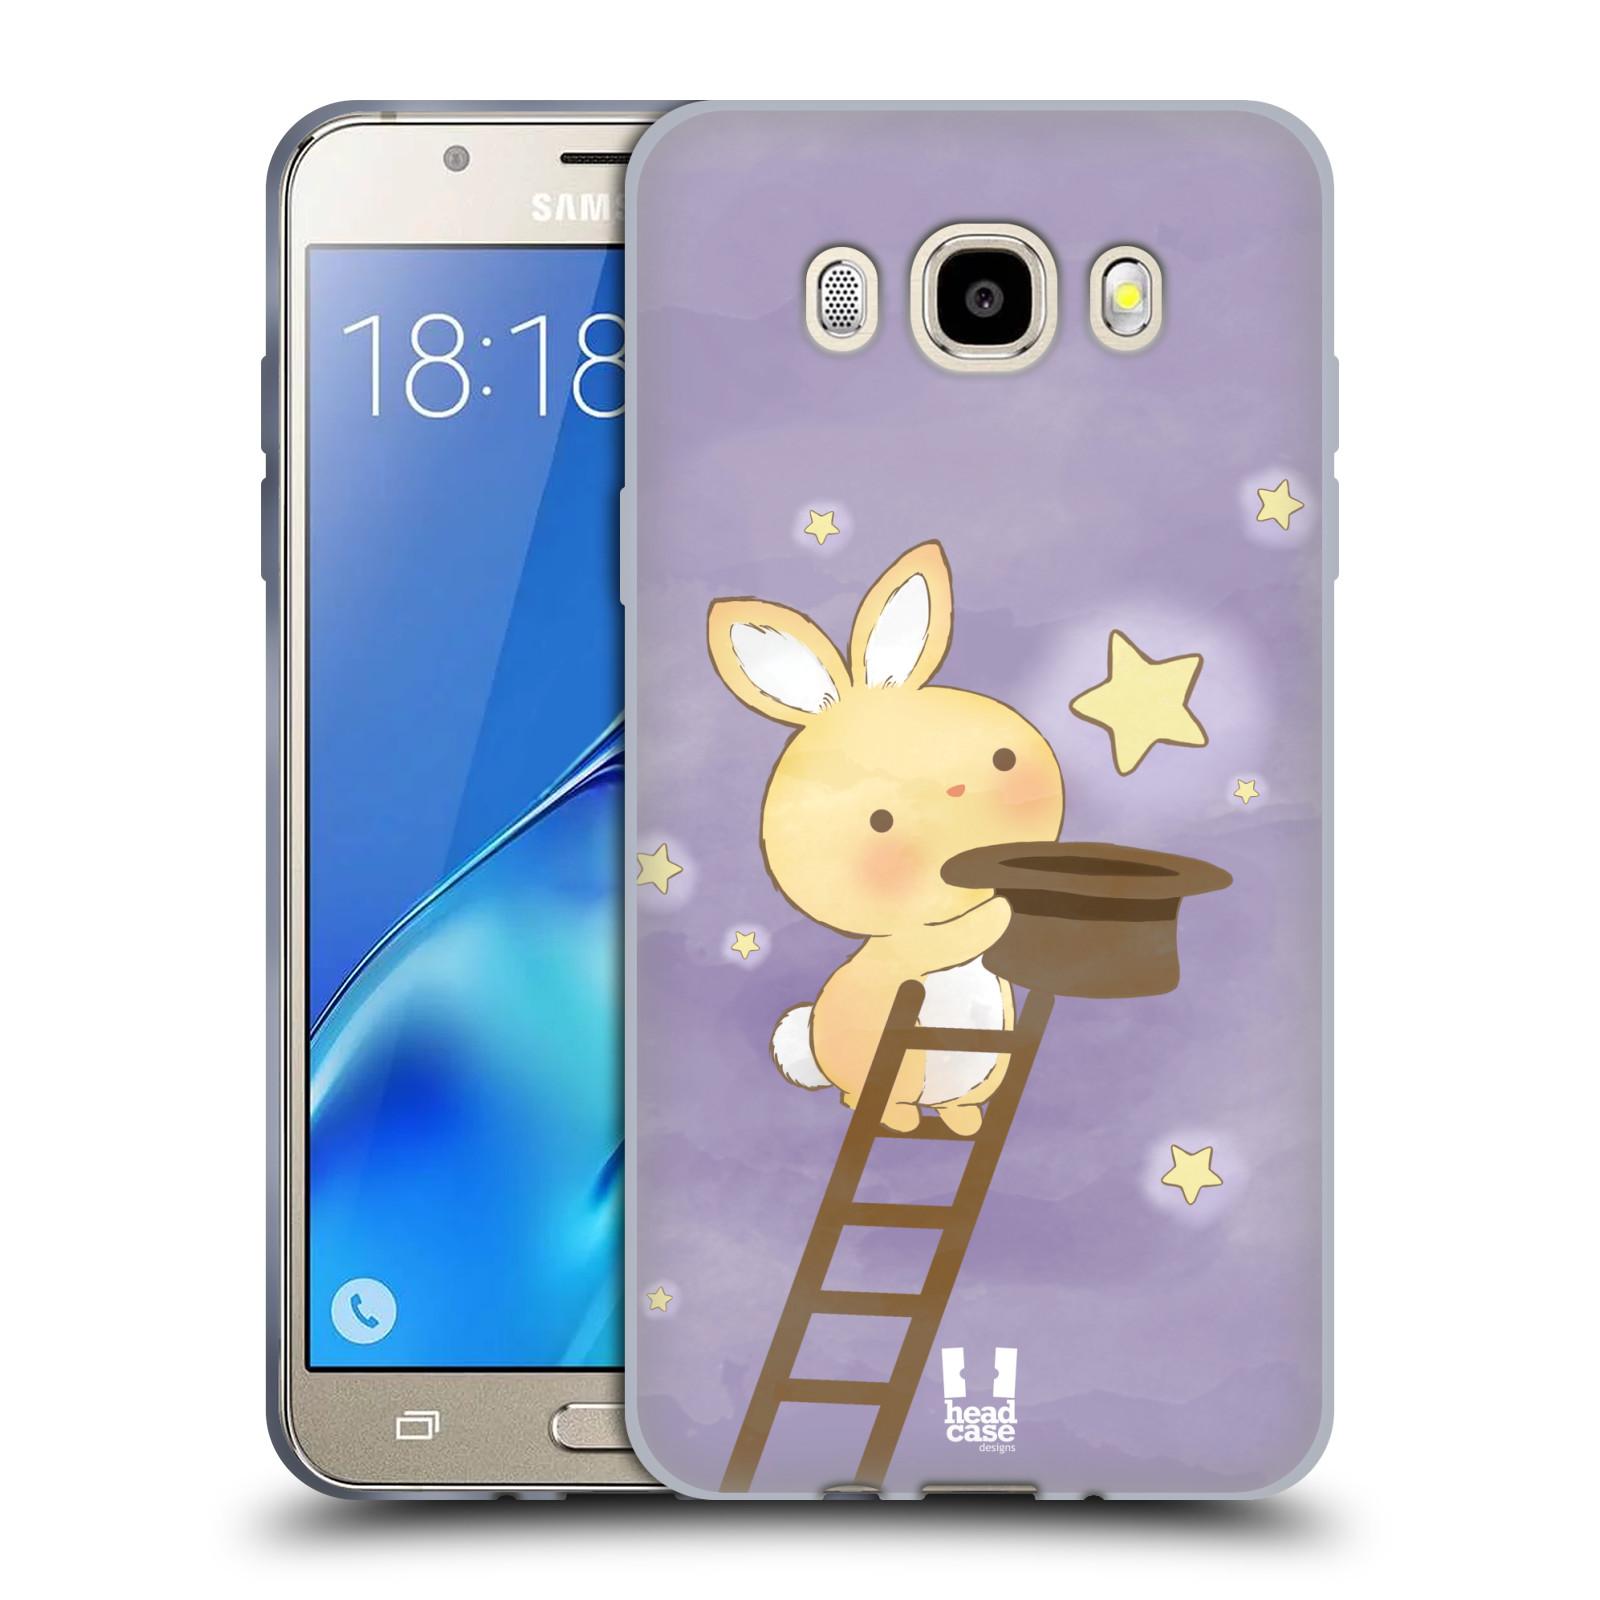 HEAD CASE silikonový obal, kryt na mobil Samsung Galaxy J5 2016, J510, J510F, (J510F DUAL SIM) vzor králíček a hvězdy fialová